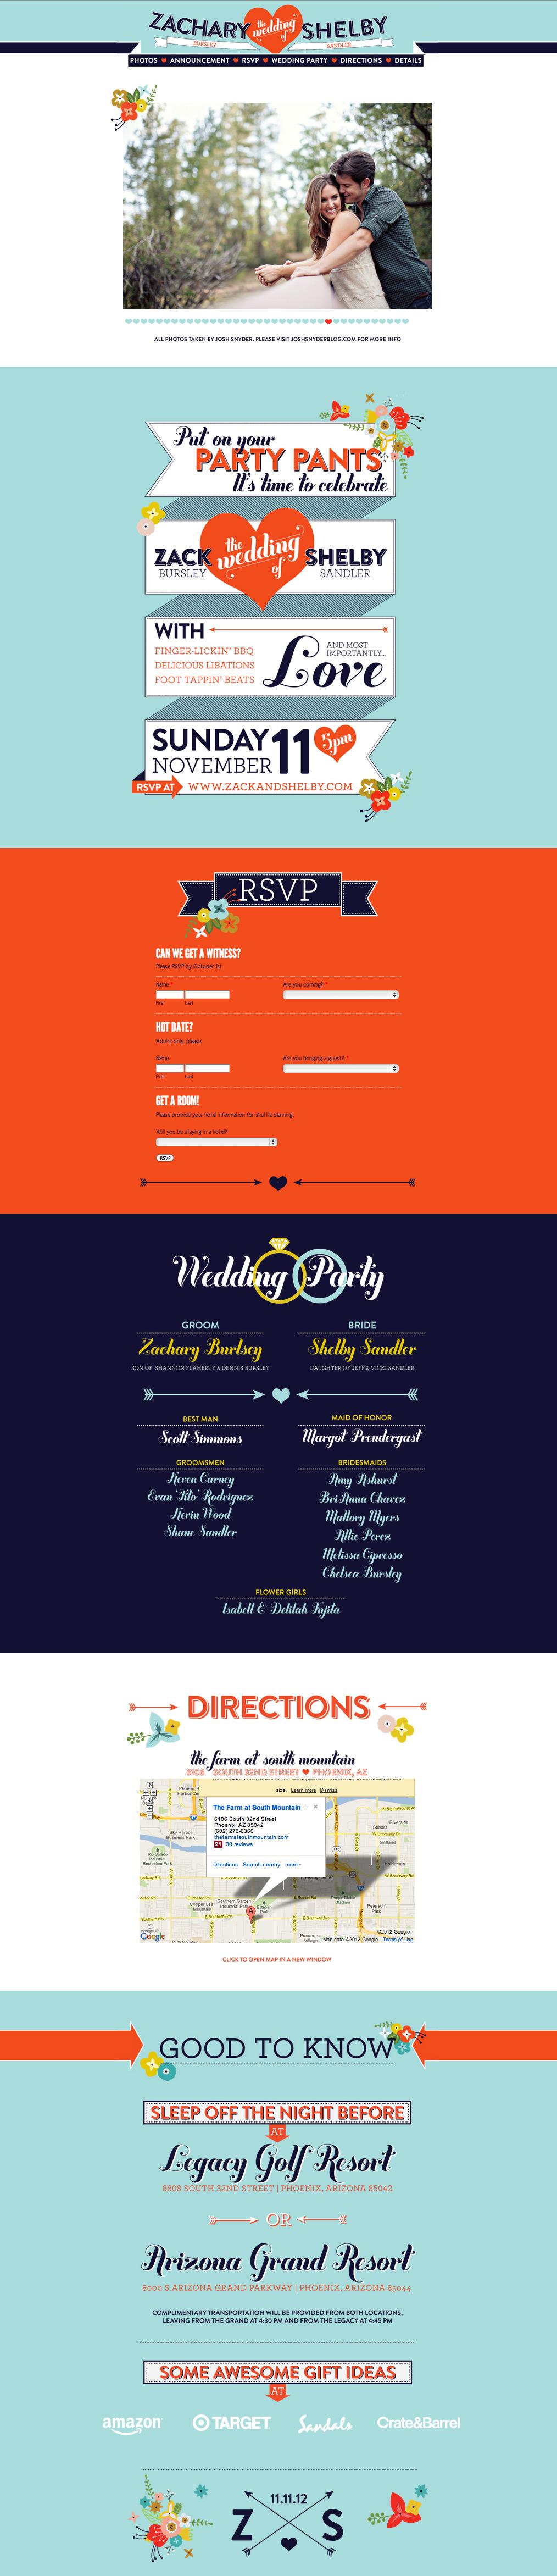 Zack & Shelby wedding website | Wedding Websites | Pinterest ...